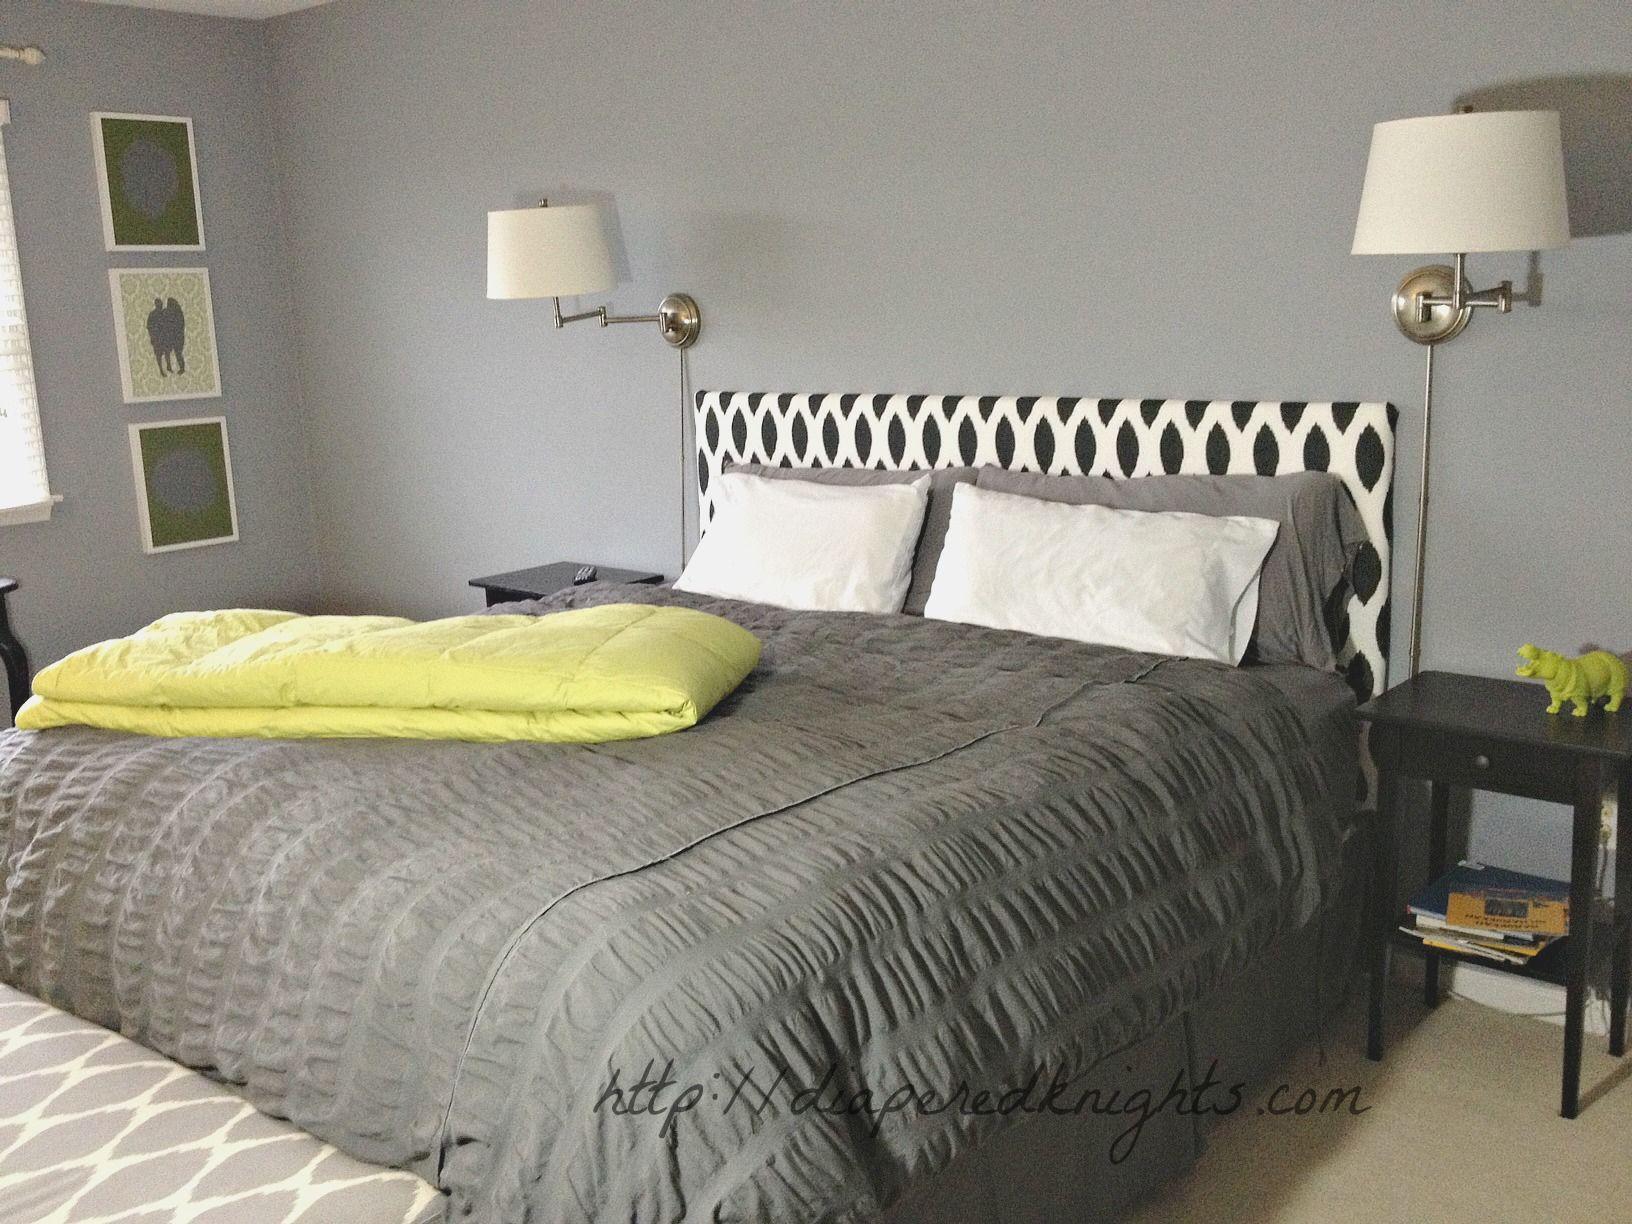 DIY Upholstered Headboard & DIY Upholstered Headboard | Crafting | Pinterest | Al dettaglio e ... pillowsntoast.com